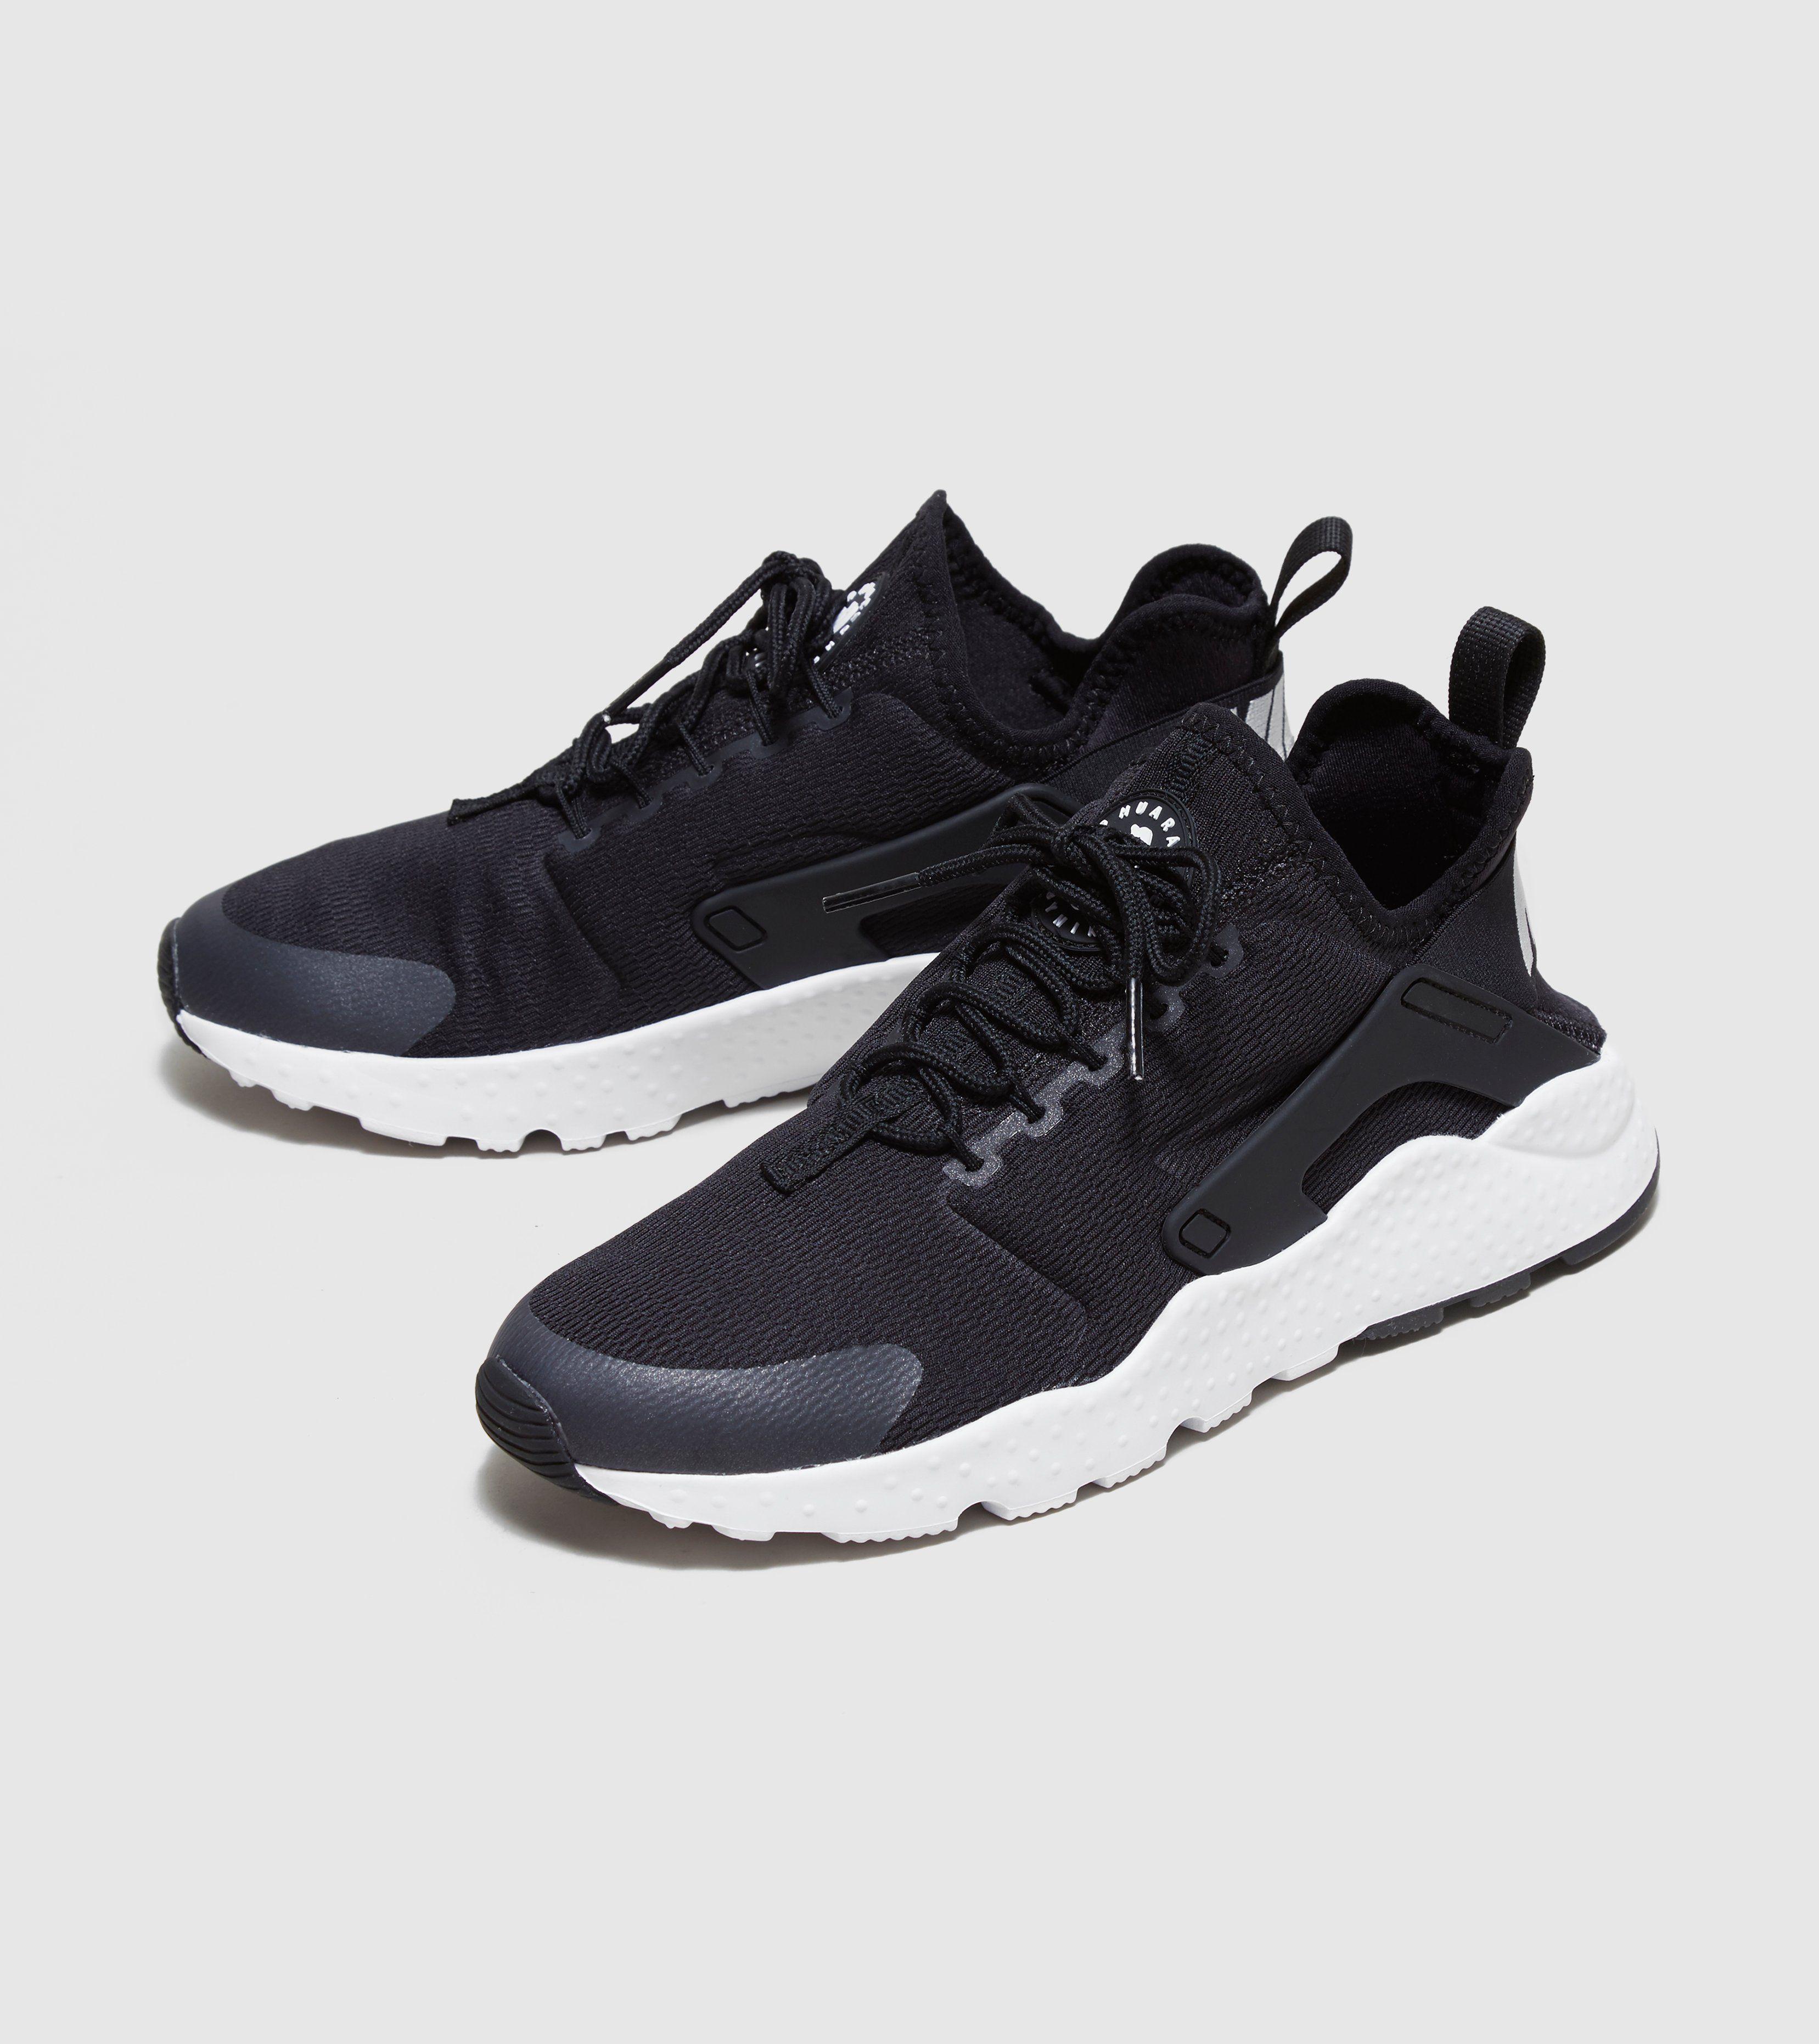 Mens Air Huarache Sneakers, Green, 7.5 Nike